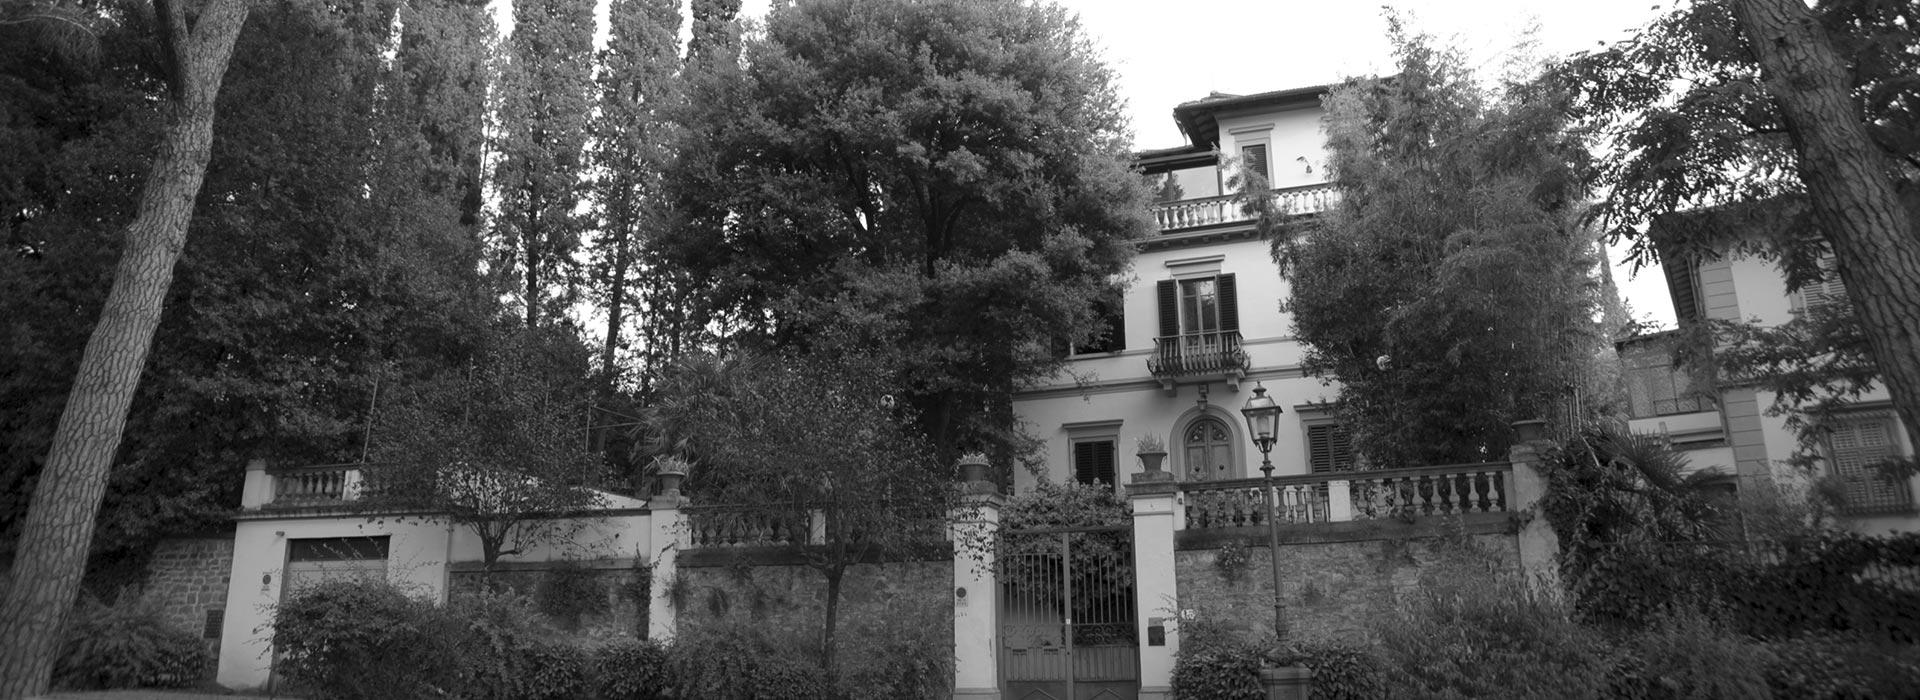 Studio Legale Sebastiani e Associati Studio legale in Firenze dal 1947